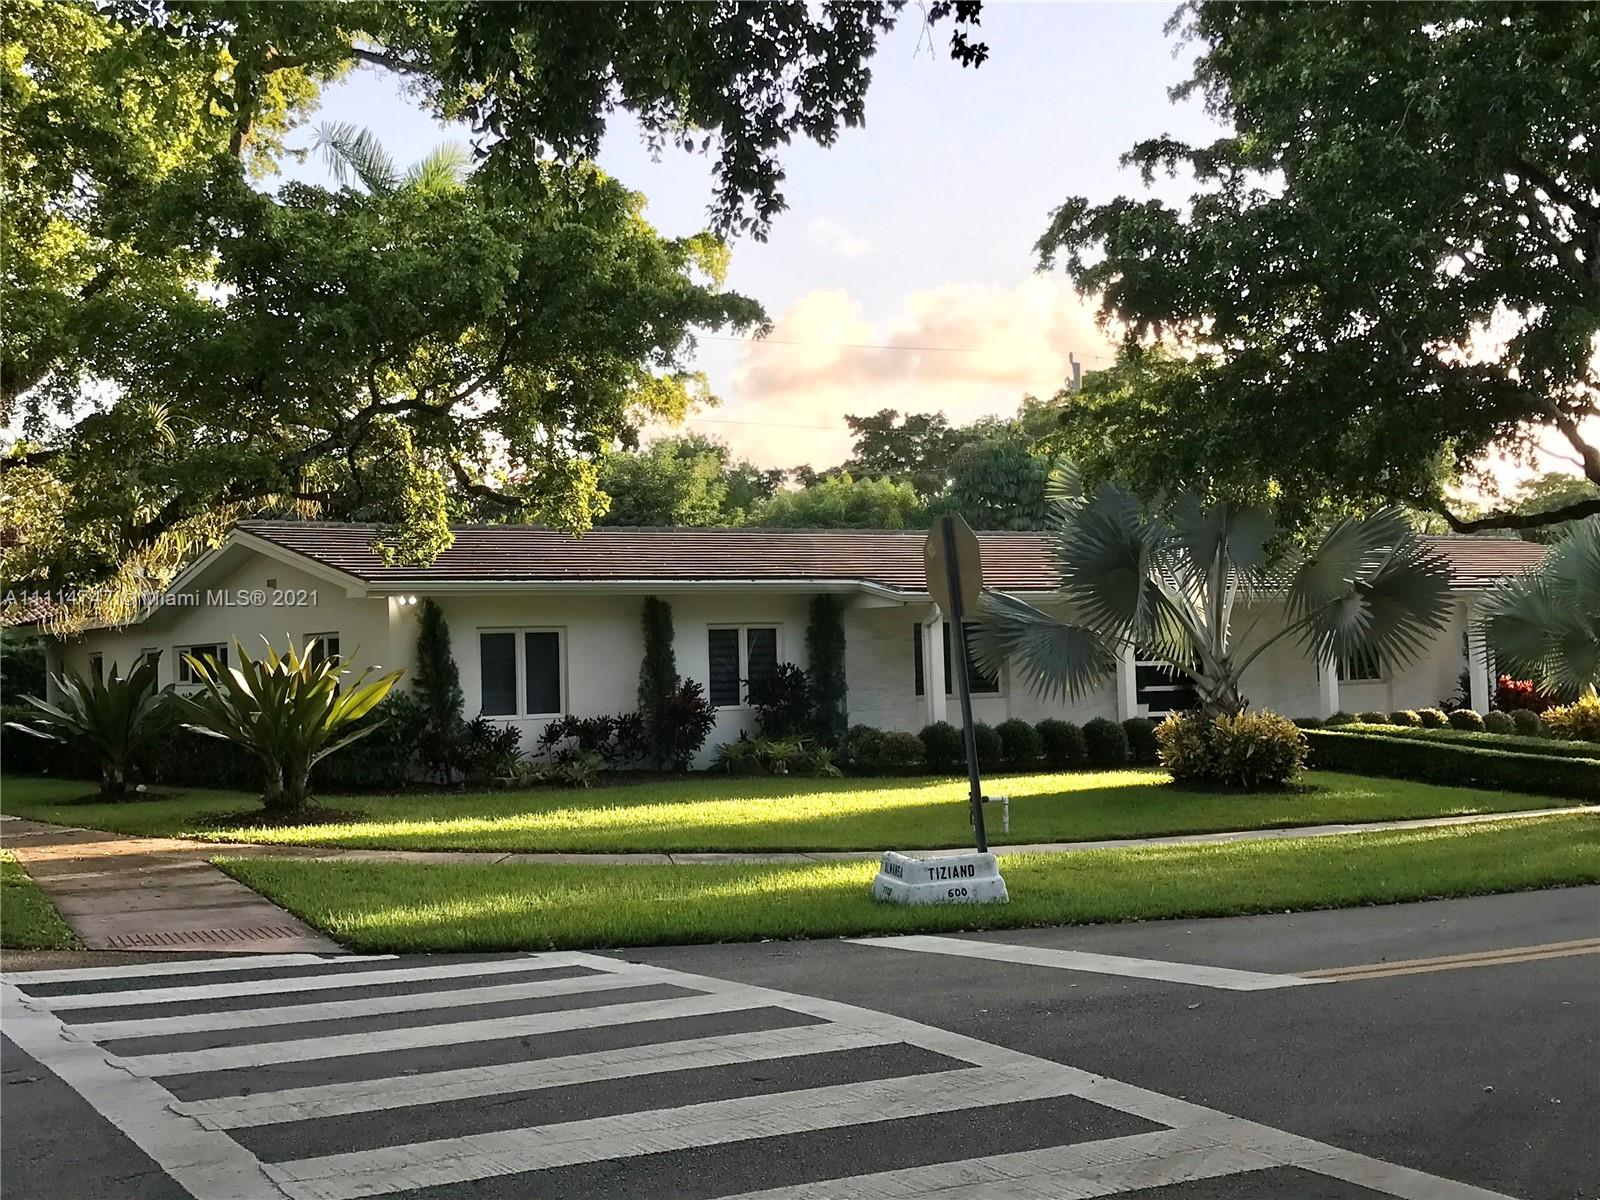 Single Family Home,For Sale,600 Tiziano Ave, Coral Gables, Florida 33143,Brickell,realty,broker,condos near me